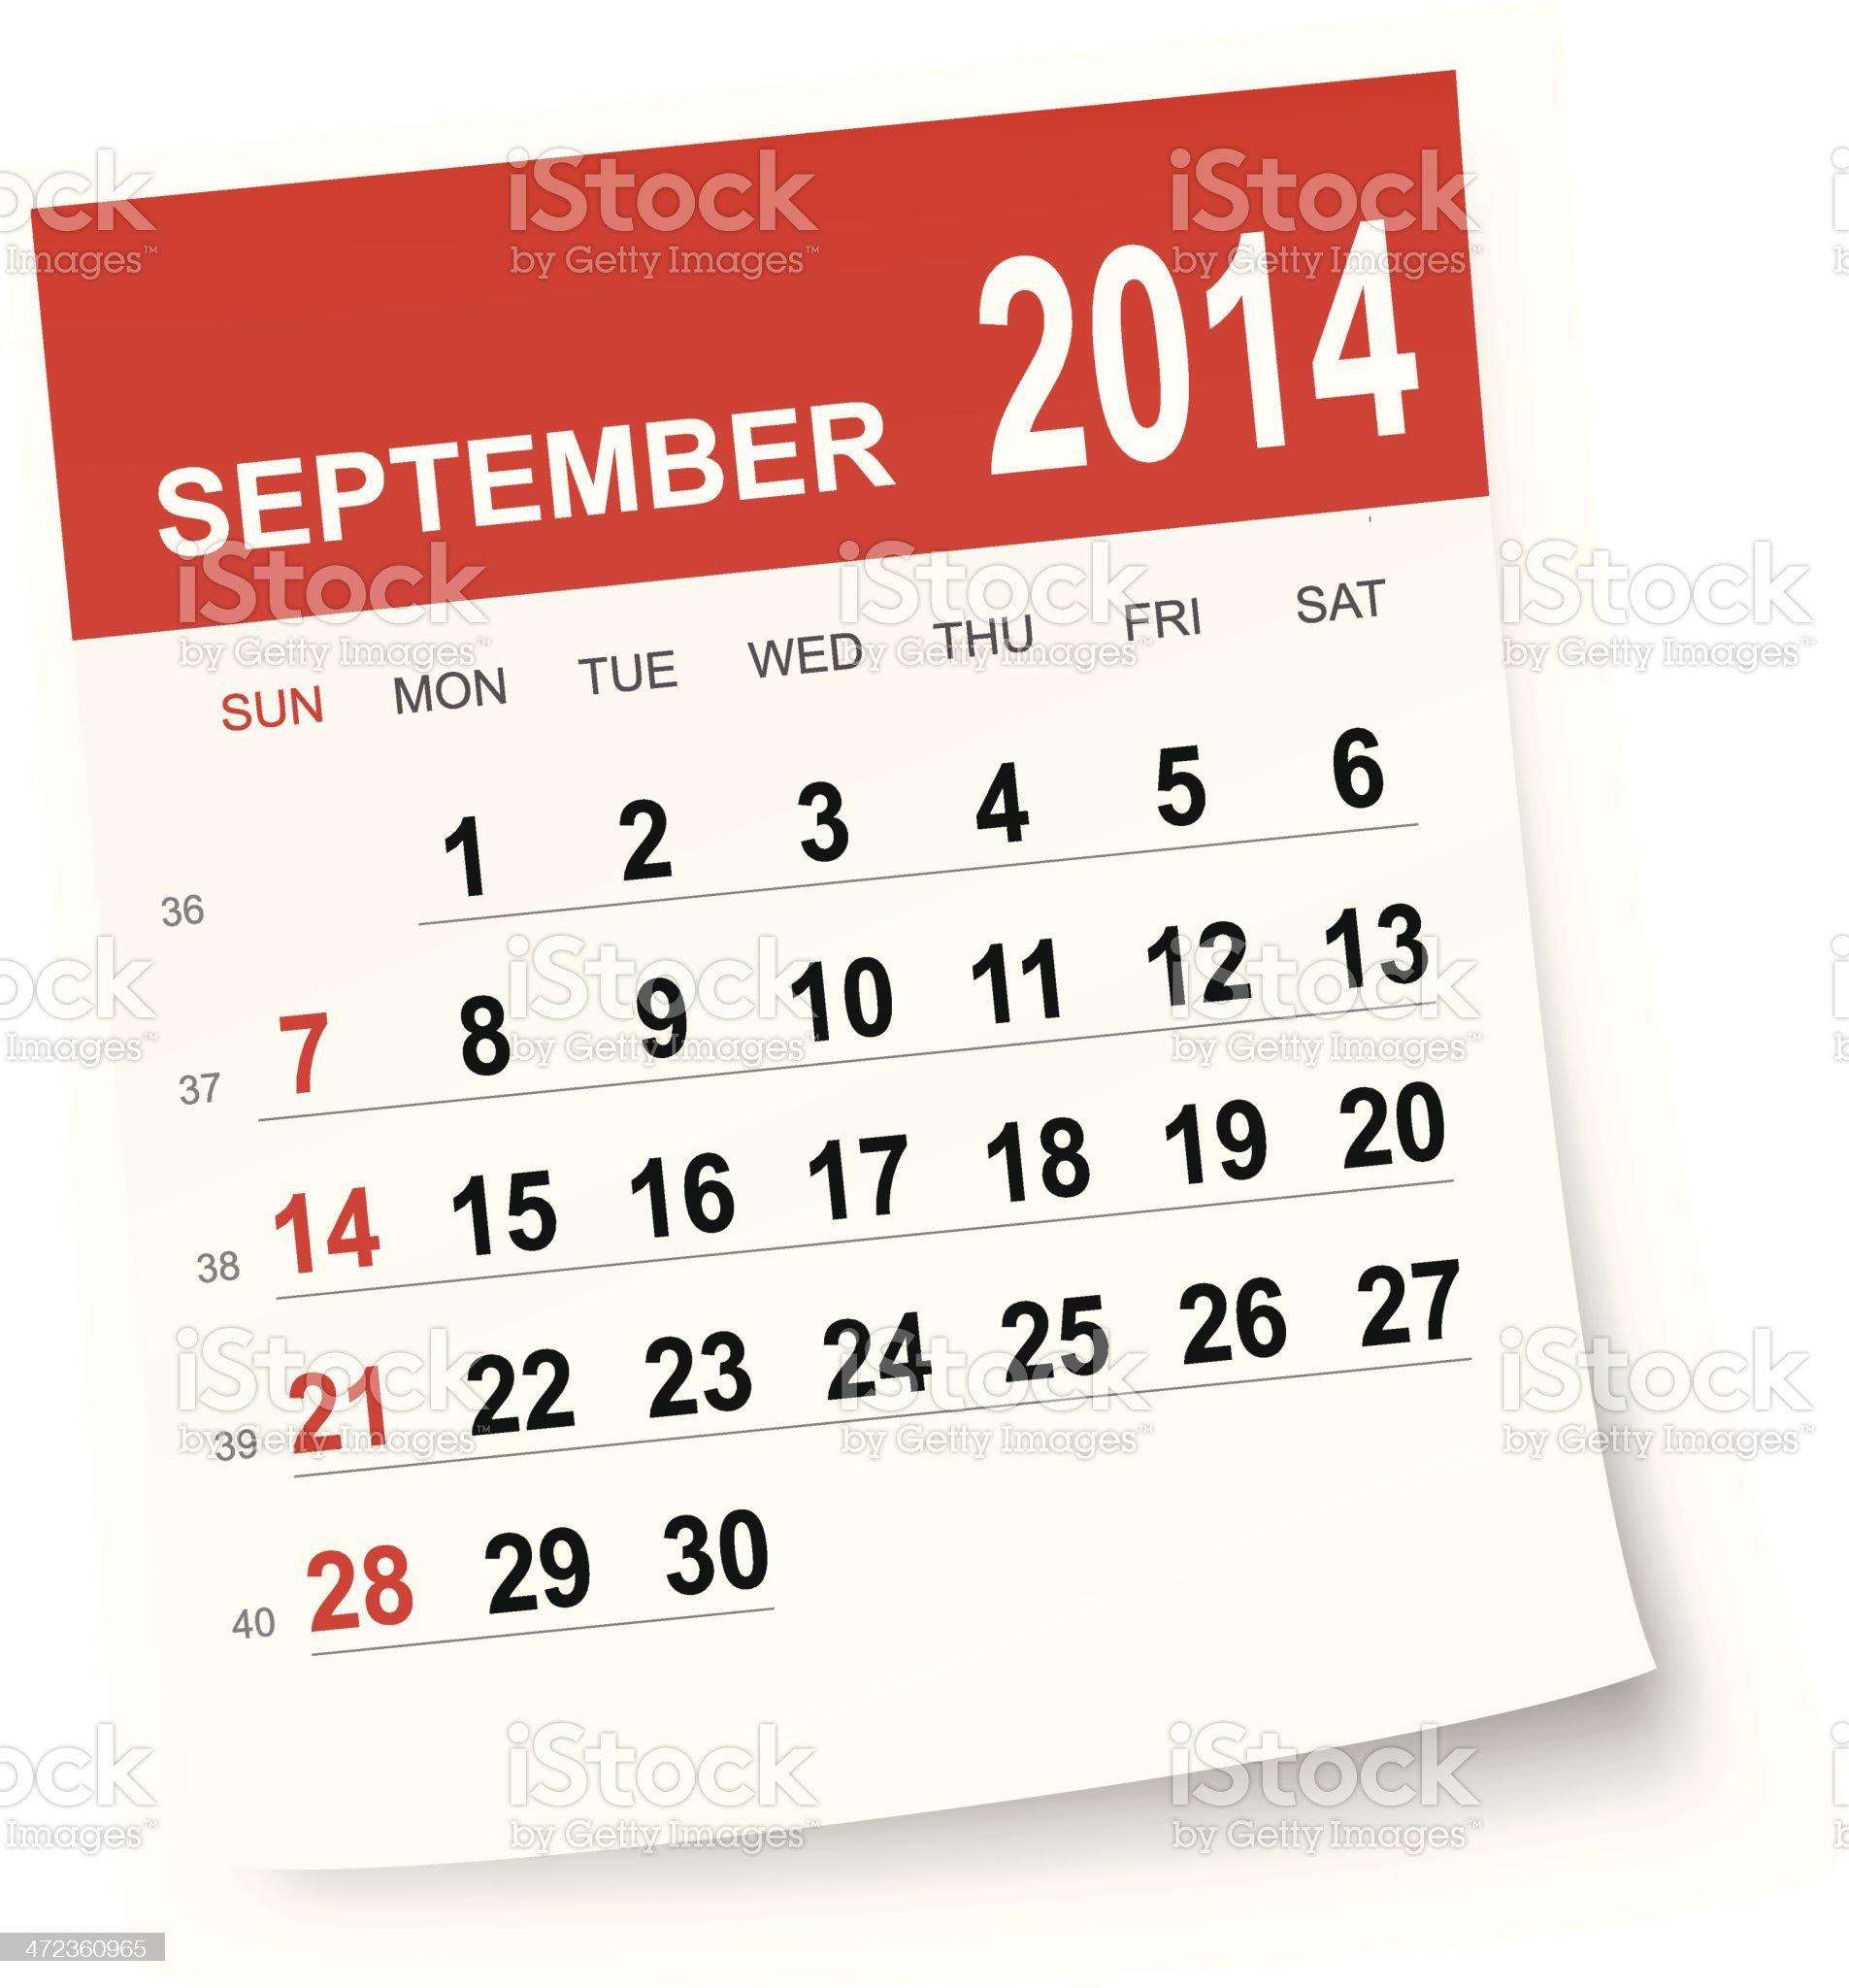 September 2014 calendar royalty-free stock vector art